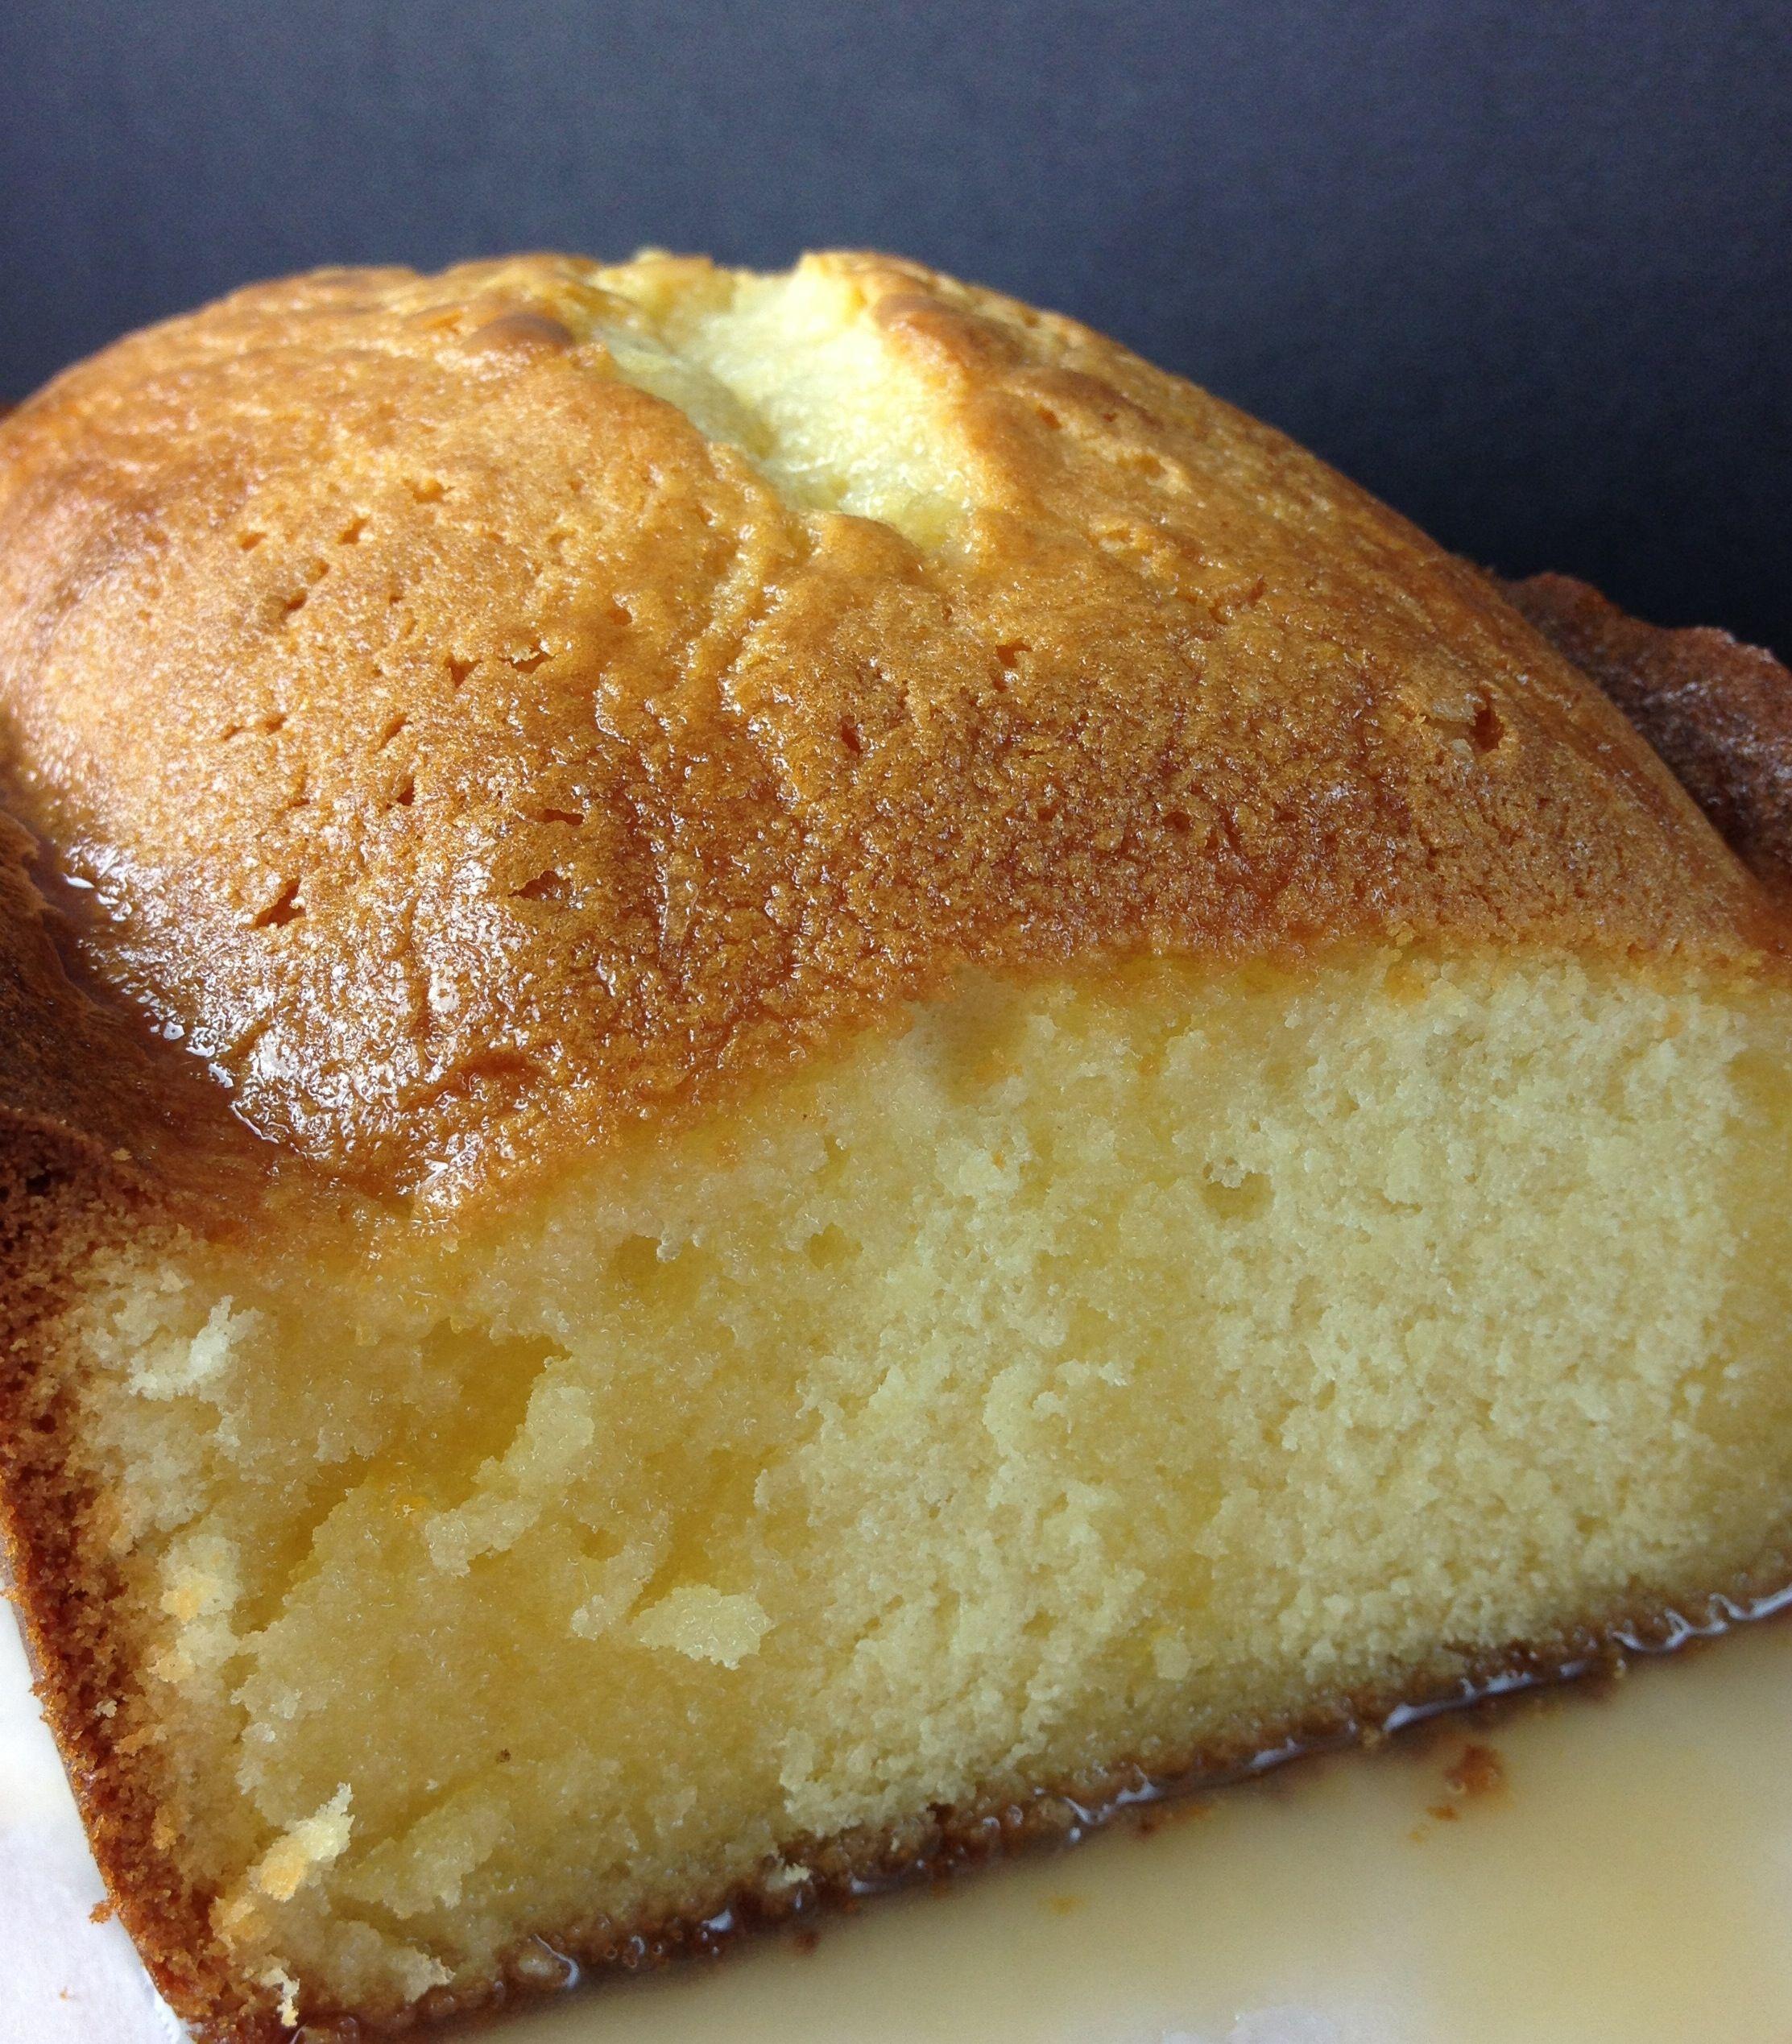 Sweetened Condensed Milk Pound Cake Marcos Benitez Sweetened Condensed Milk Pound C In 2020 Condensed Milk Pound Cake Recipe Sheet Cake Recipes Cake Recipes Uk